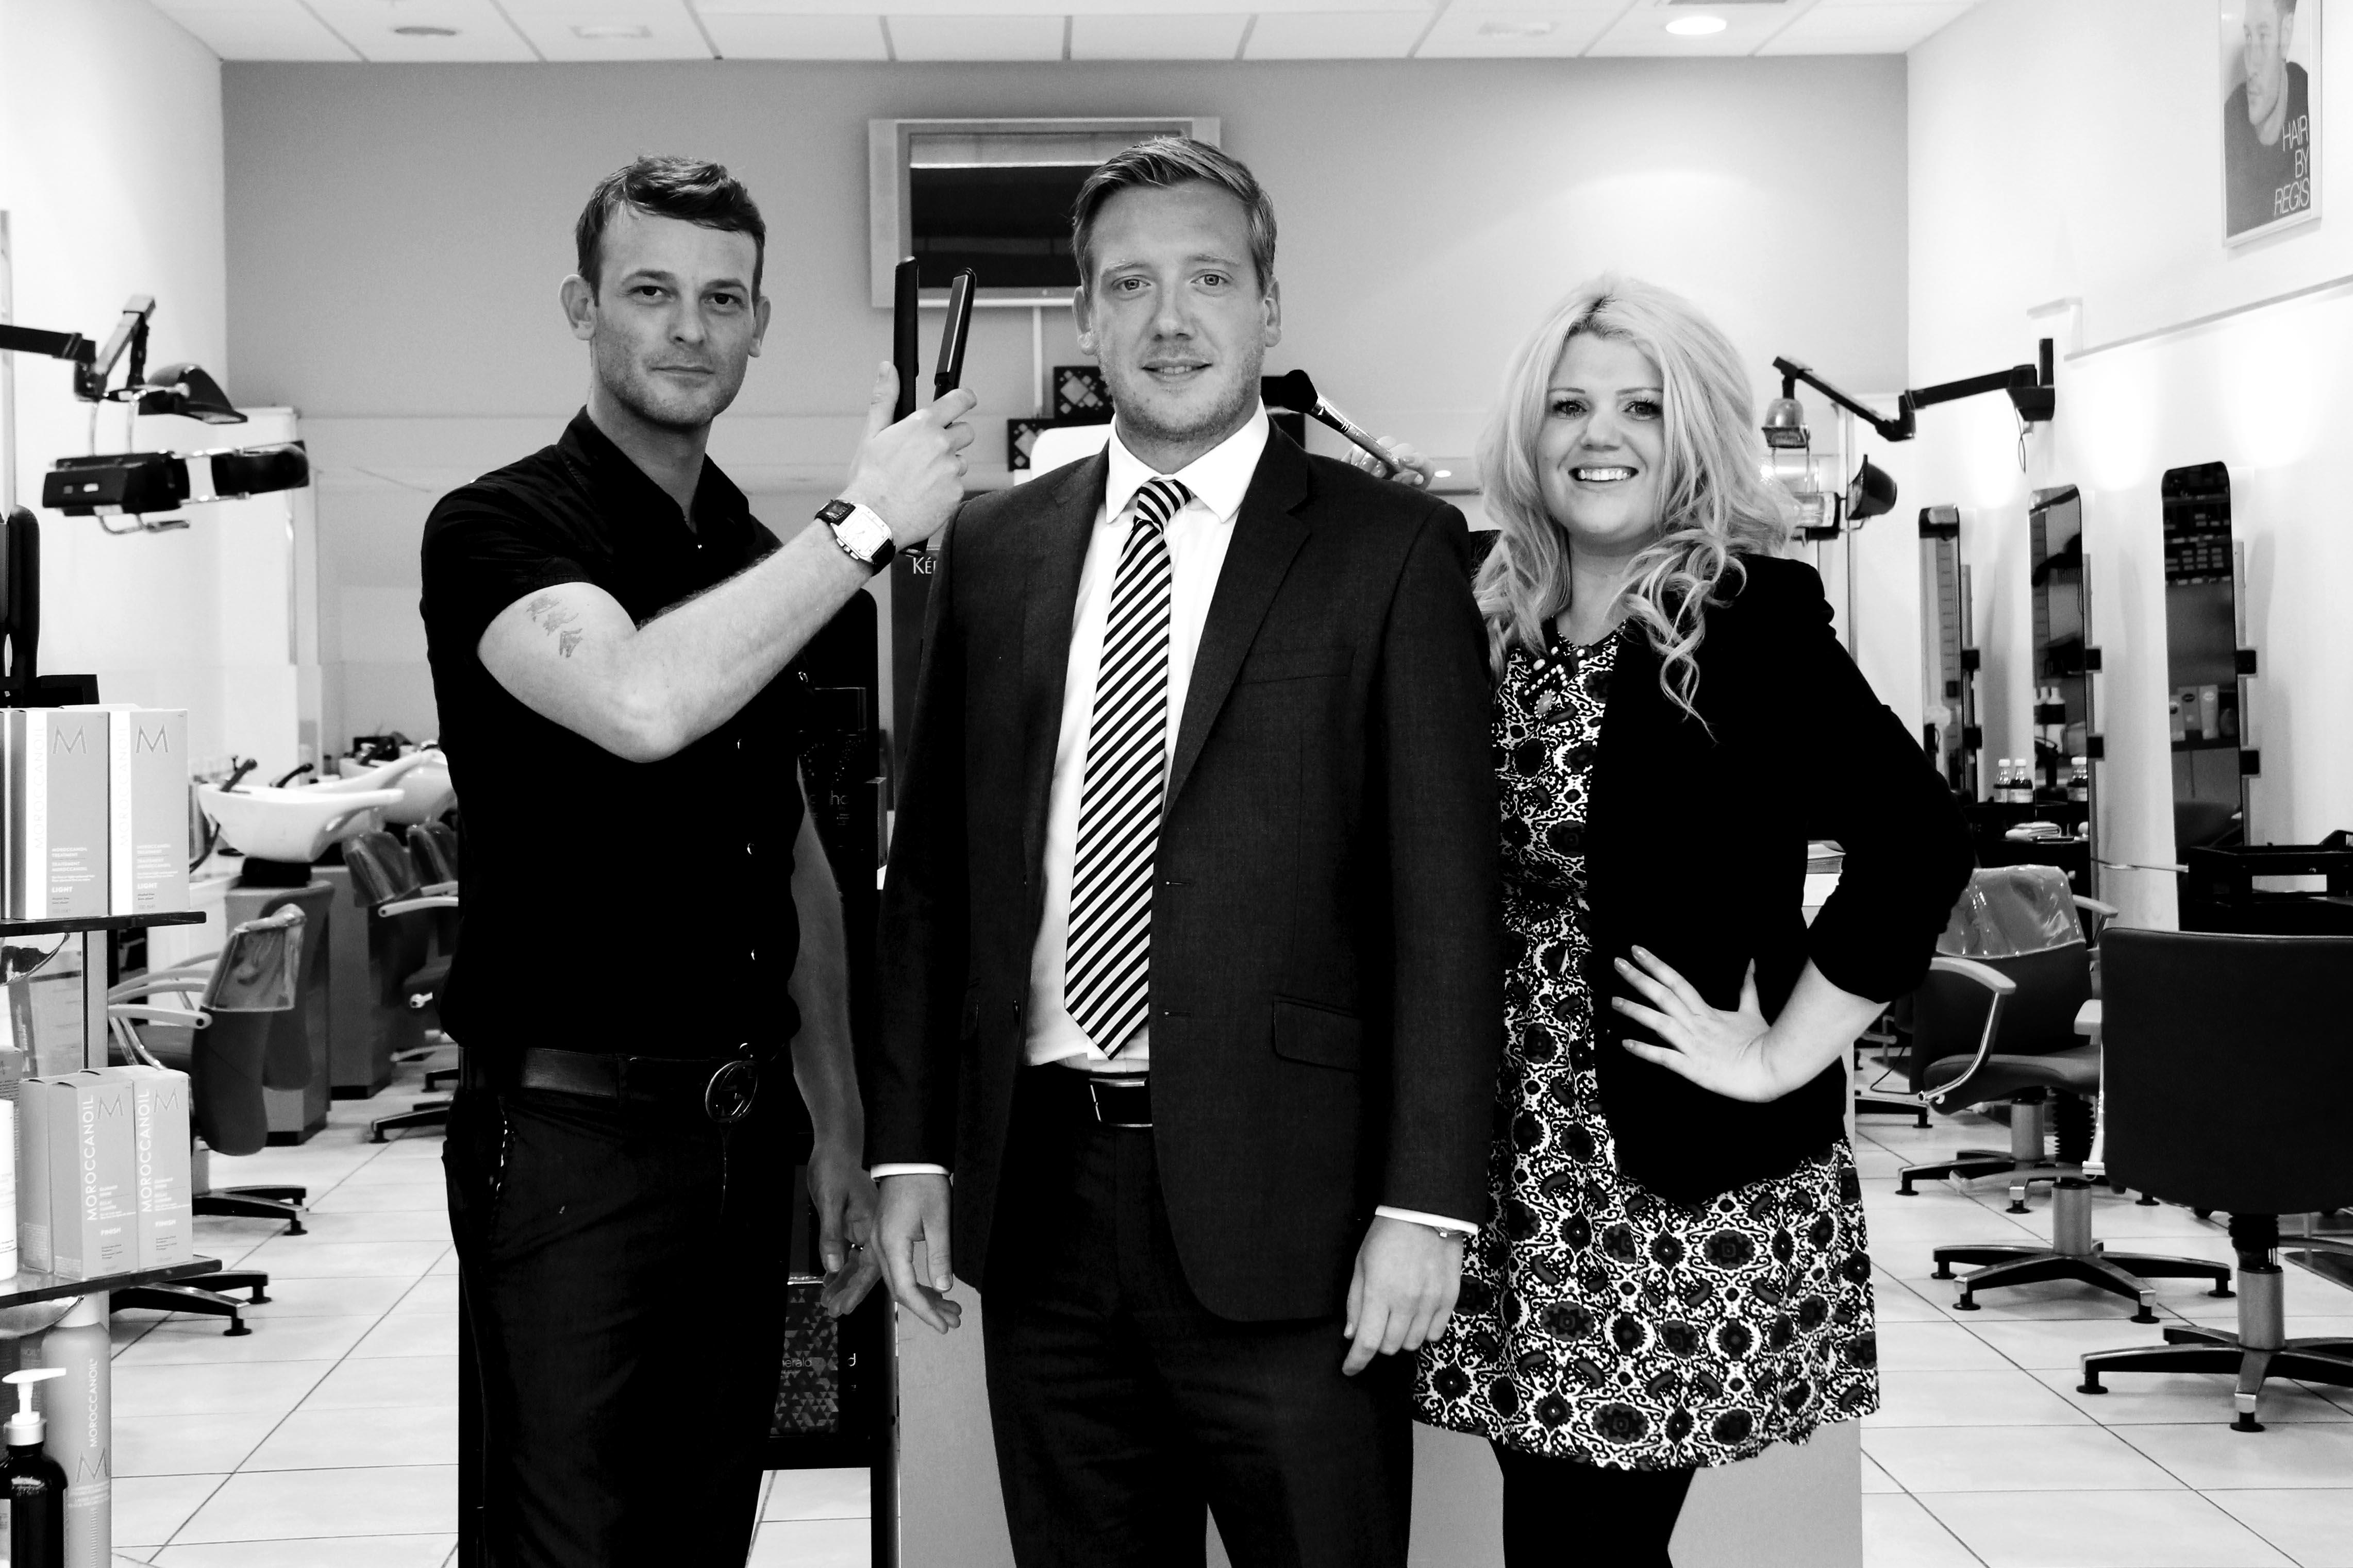 National Men's Grooming Day Winner is Dan Deakin   Beauty by Blondie